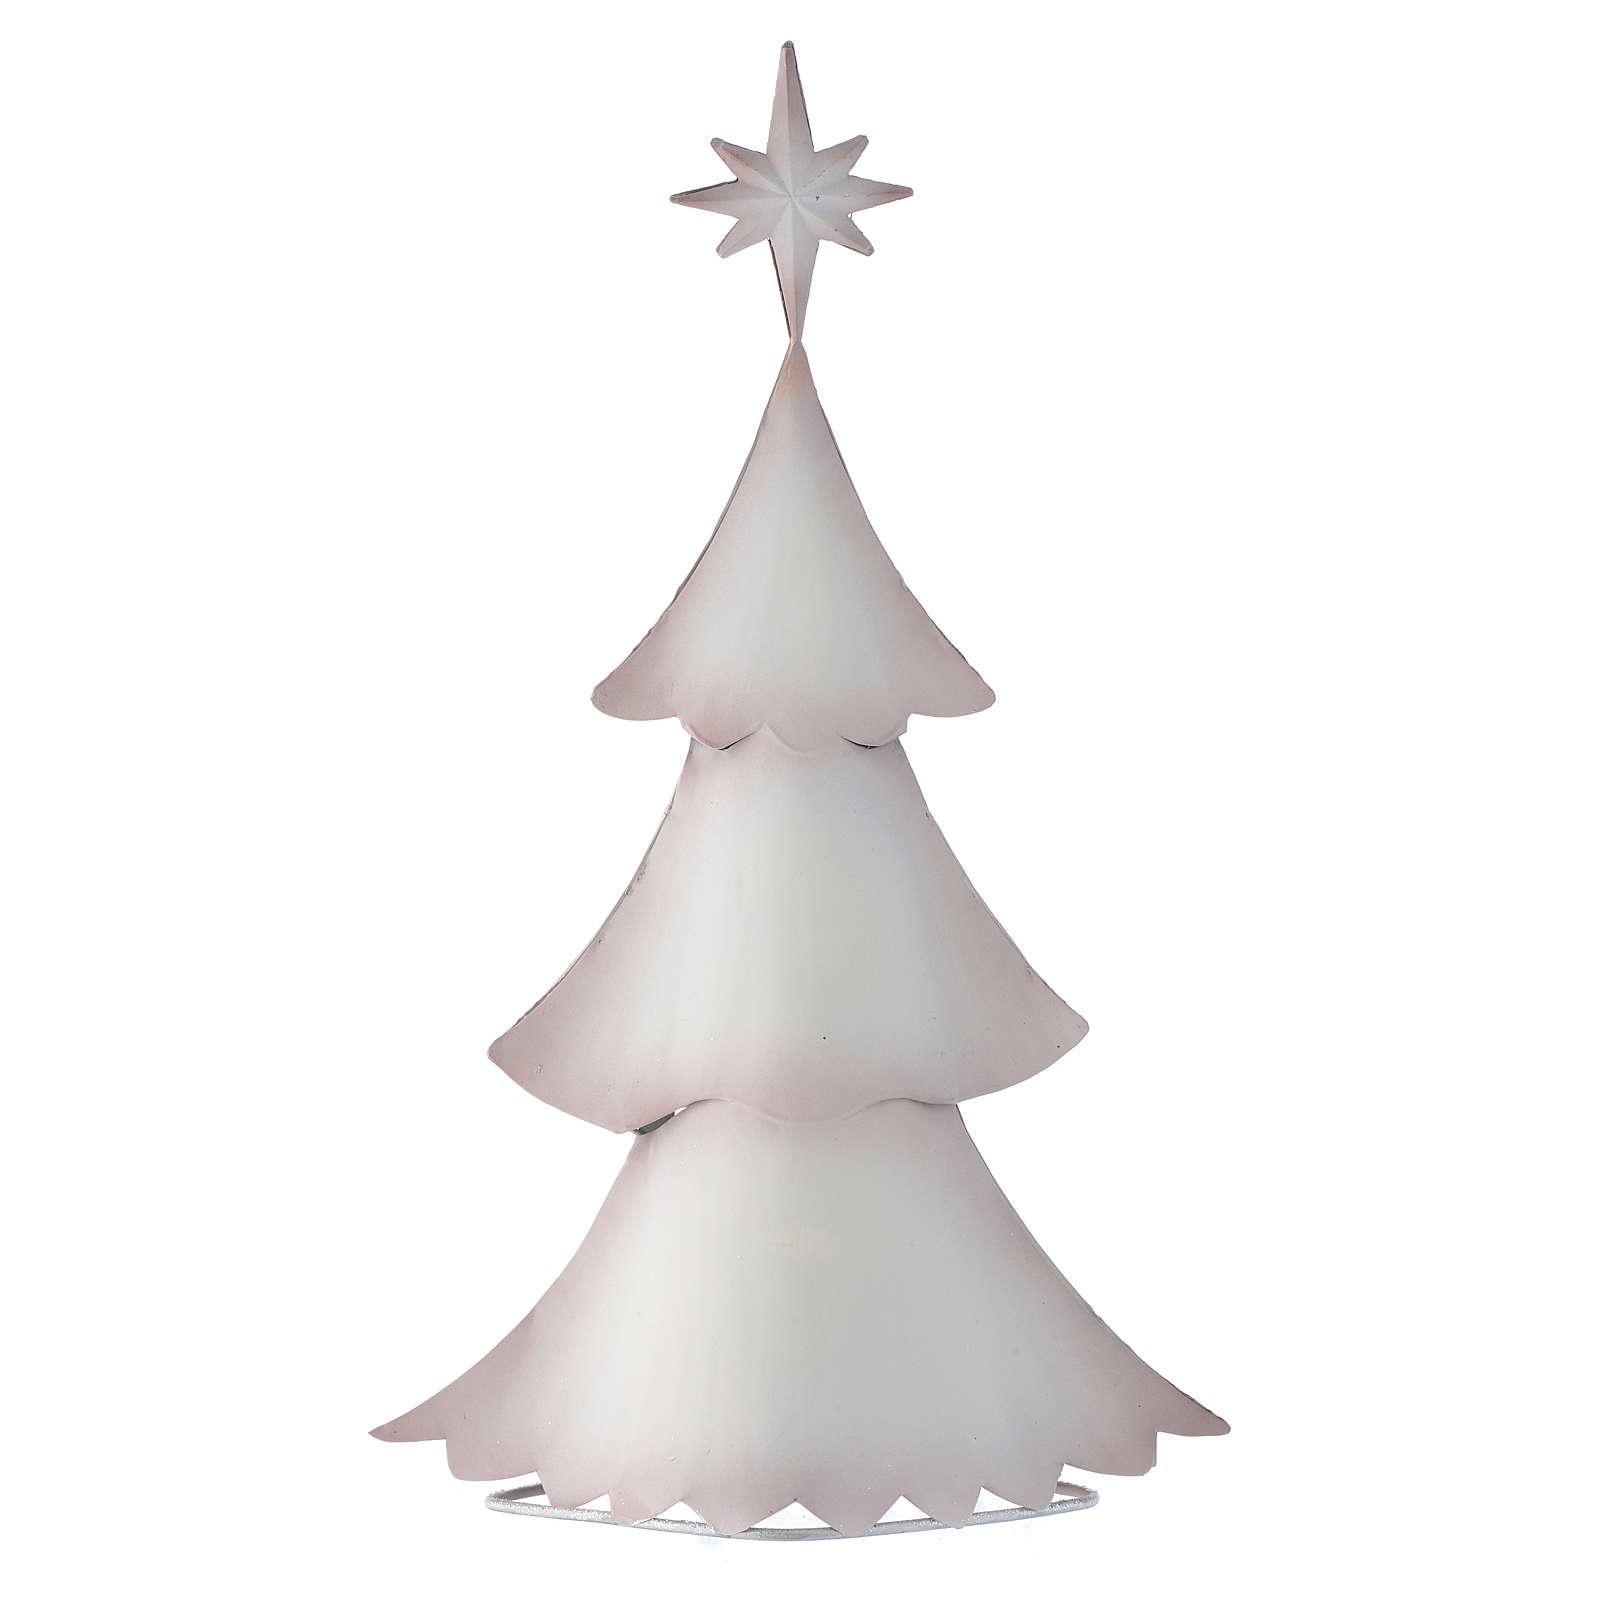 Sapin de Noël blanc stylisé en métal 3